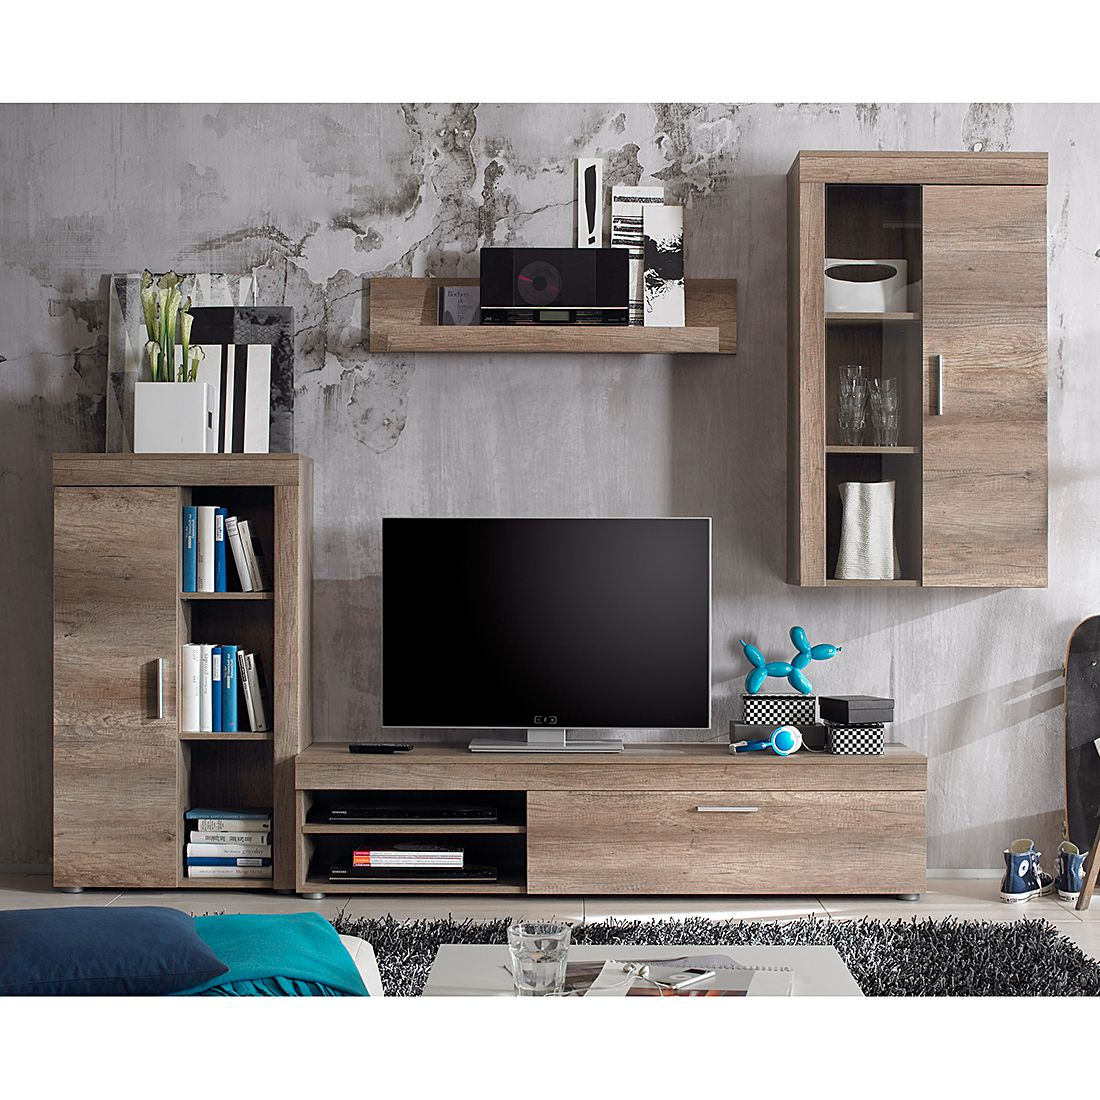 Meuble Tv Imitation Bois Artzein Com # Meuble Tv Imitation Bois